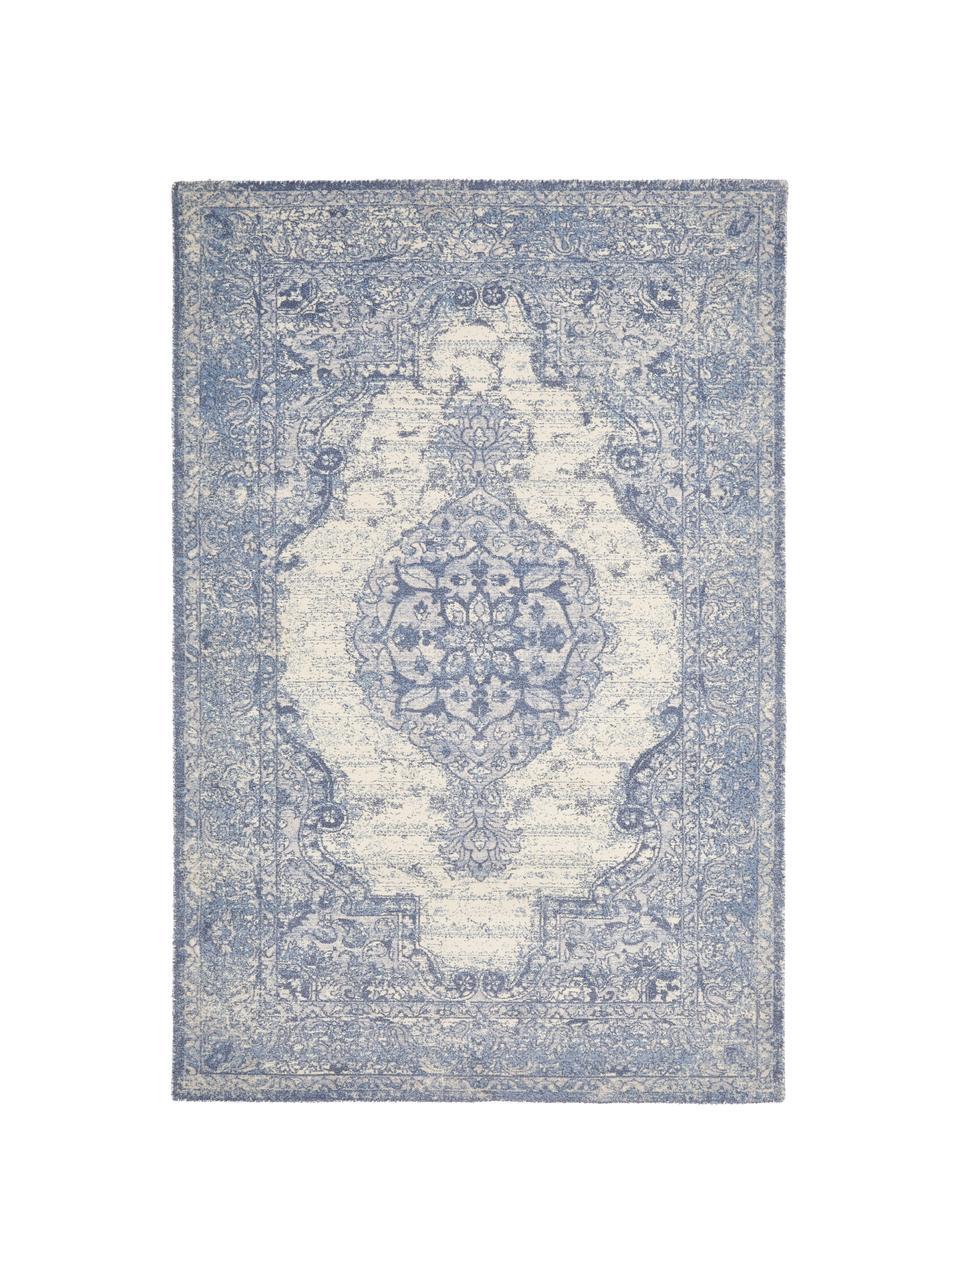 Teppich Elegant im Vintage Style, Flor: 100% Nylon, Blau, B 120 x L 180 cm (Größe S)